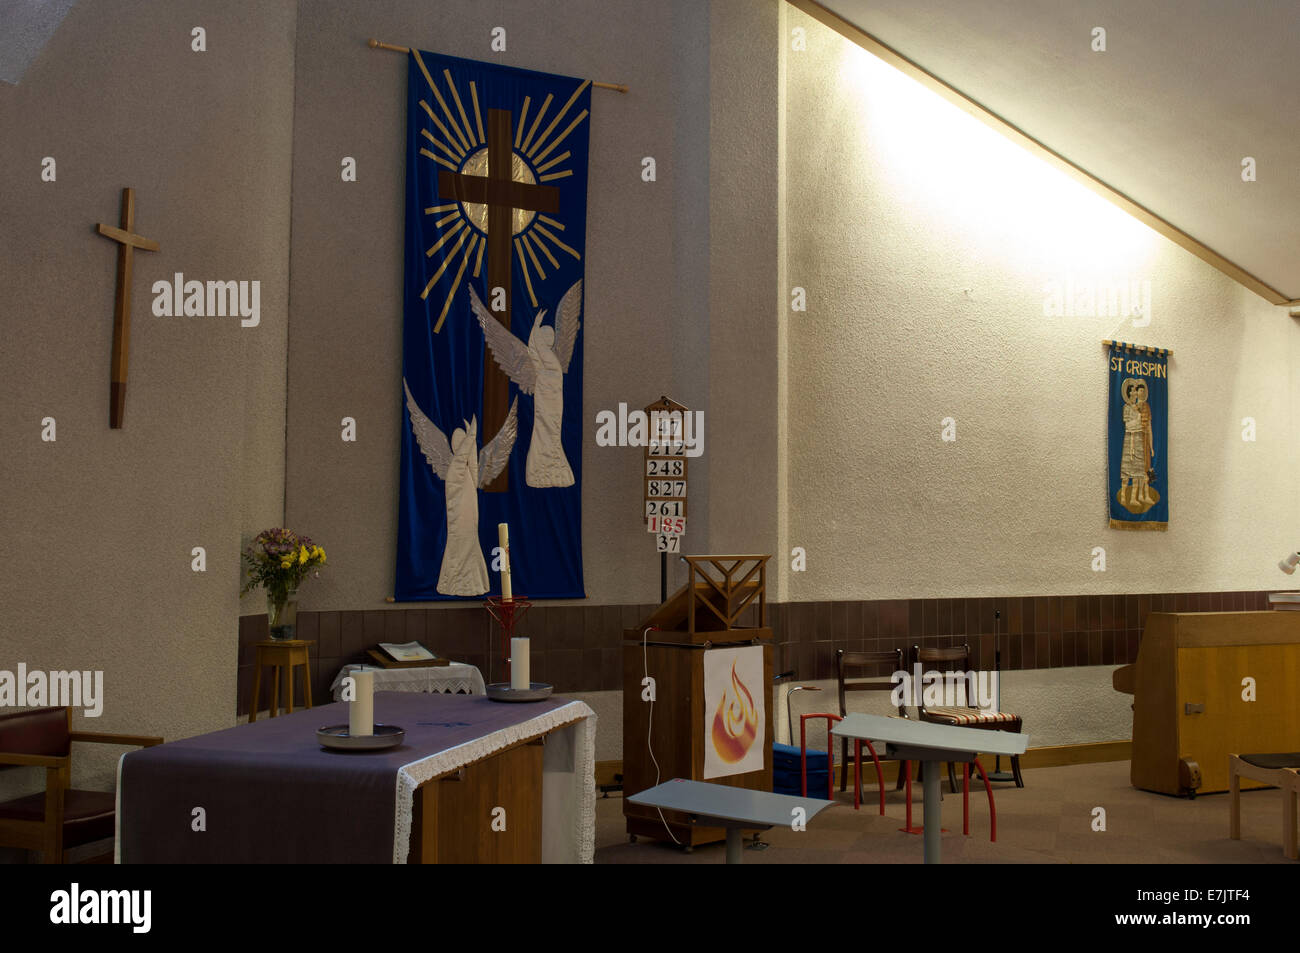 Modern Church Interiors Stock Photos & Modern Church Interiors Stock ...